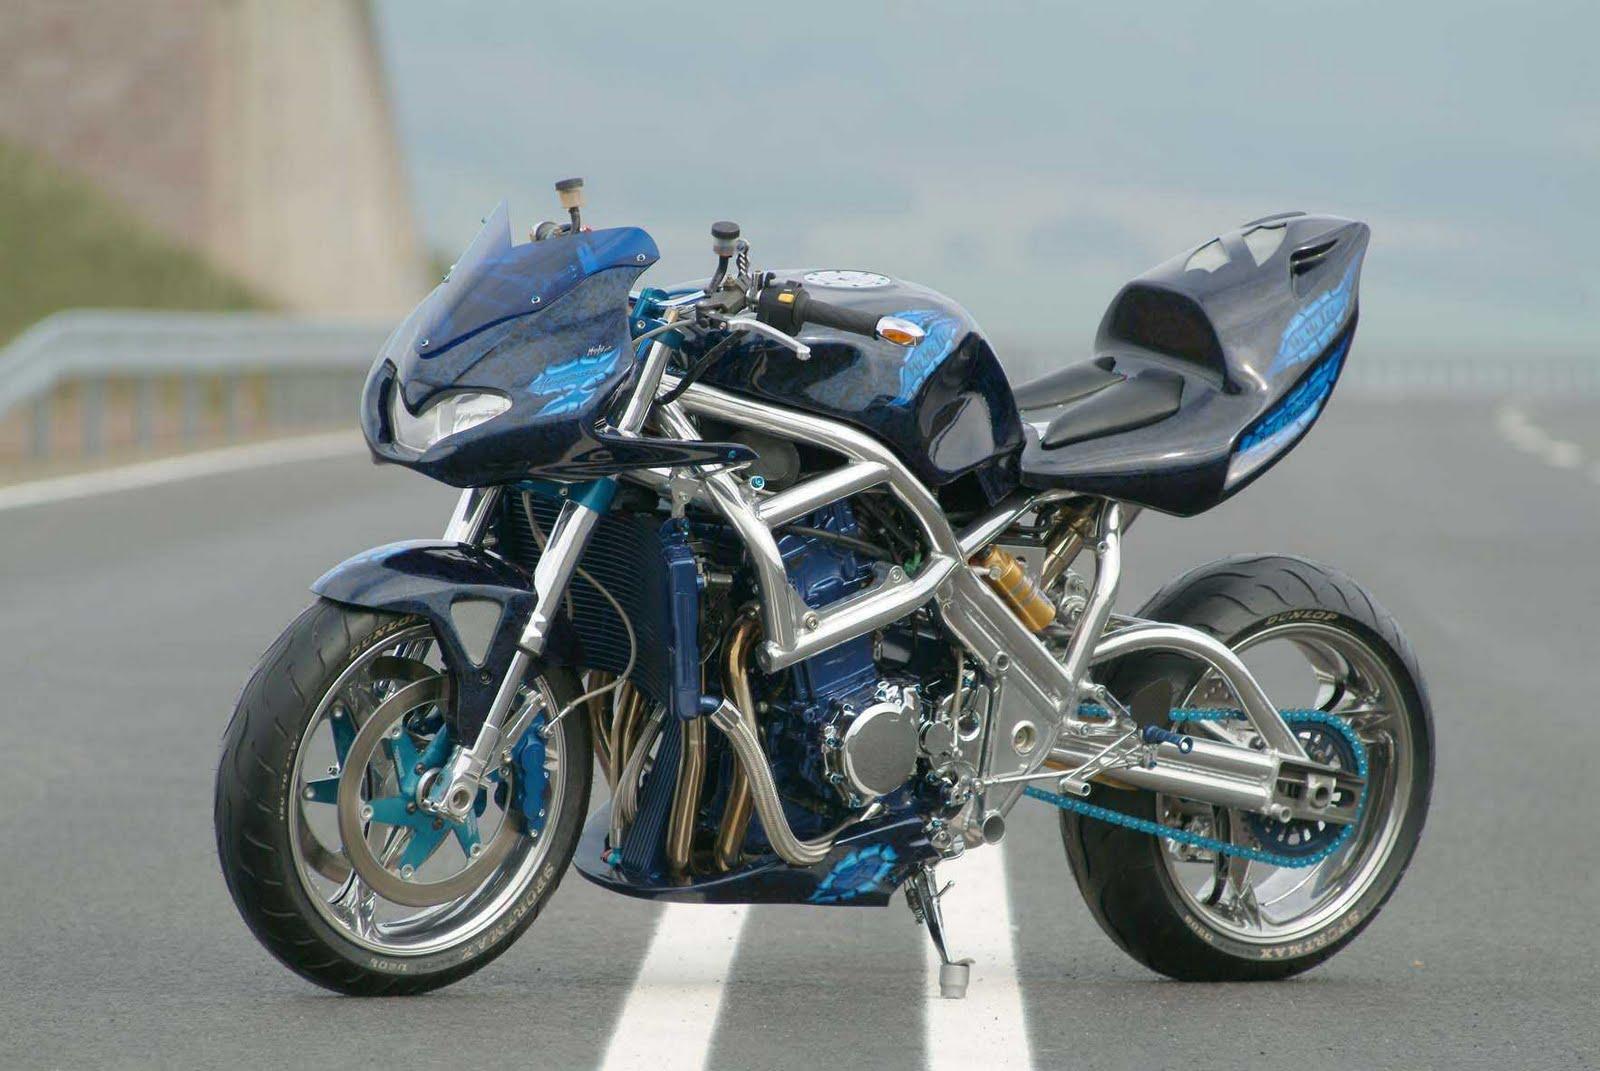 [Motos Tuneadas - Imagenes] - Autos y Motos - Taringa!